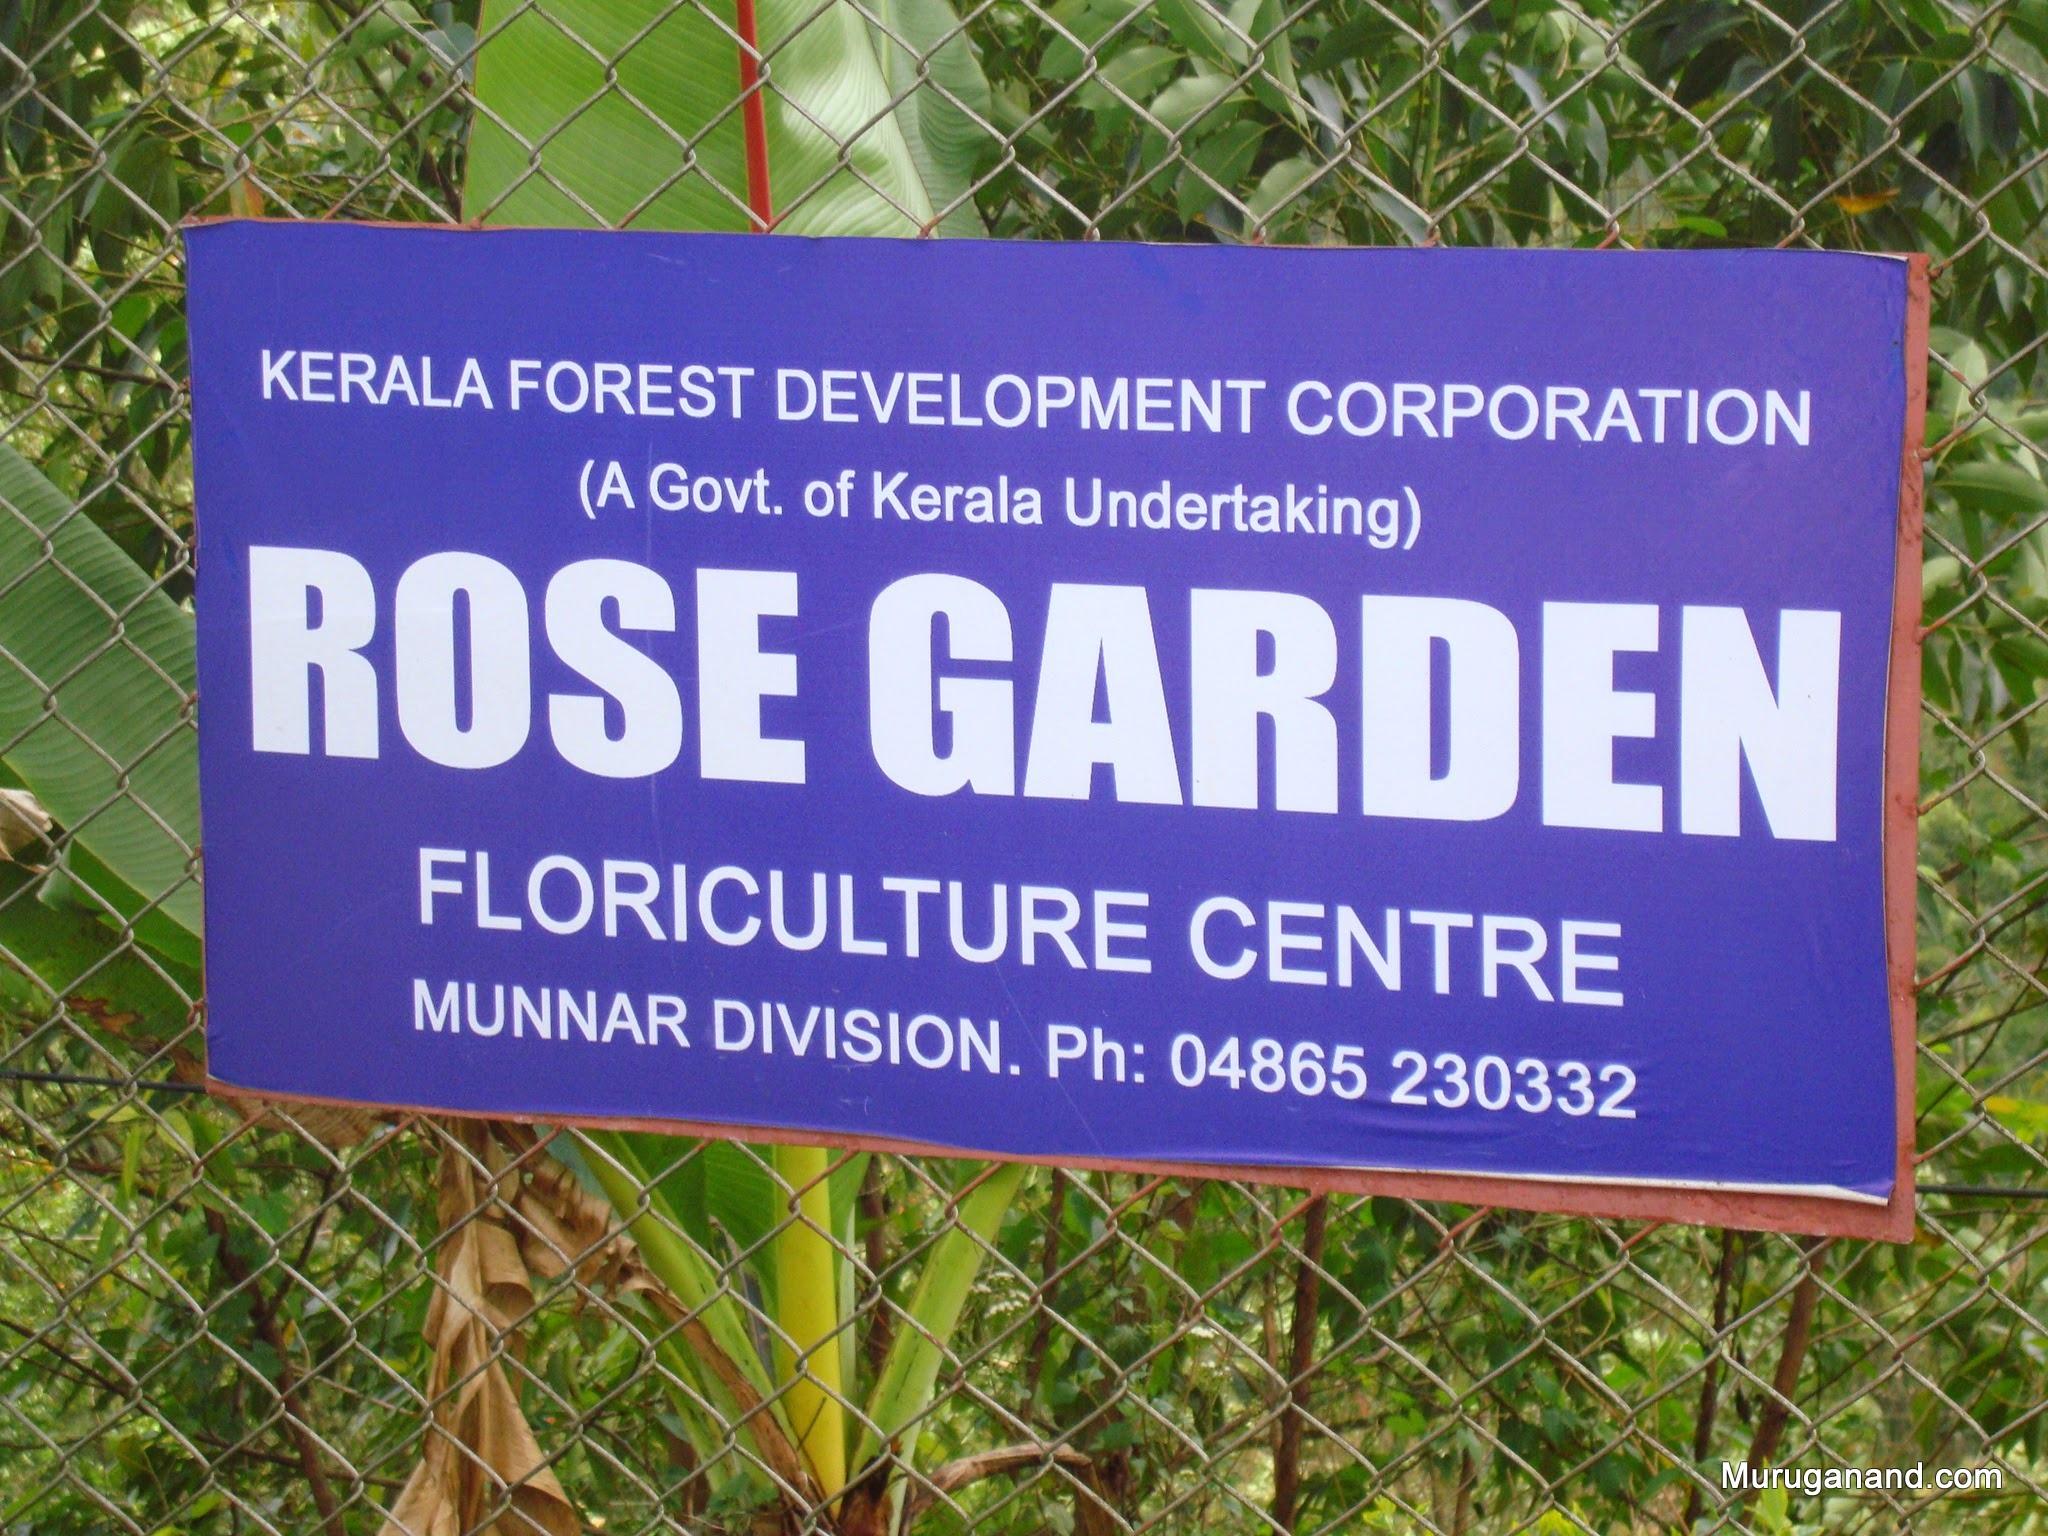 Start sight seeing with Rose Garden